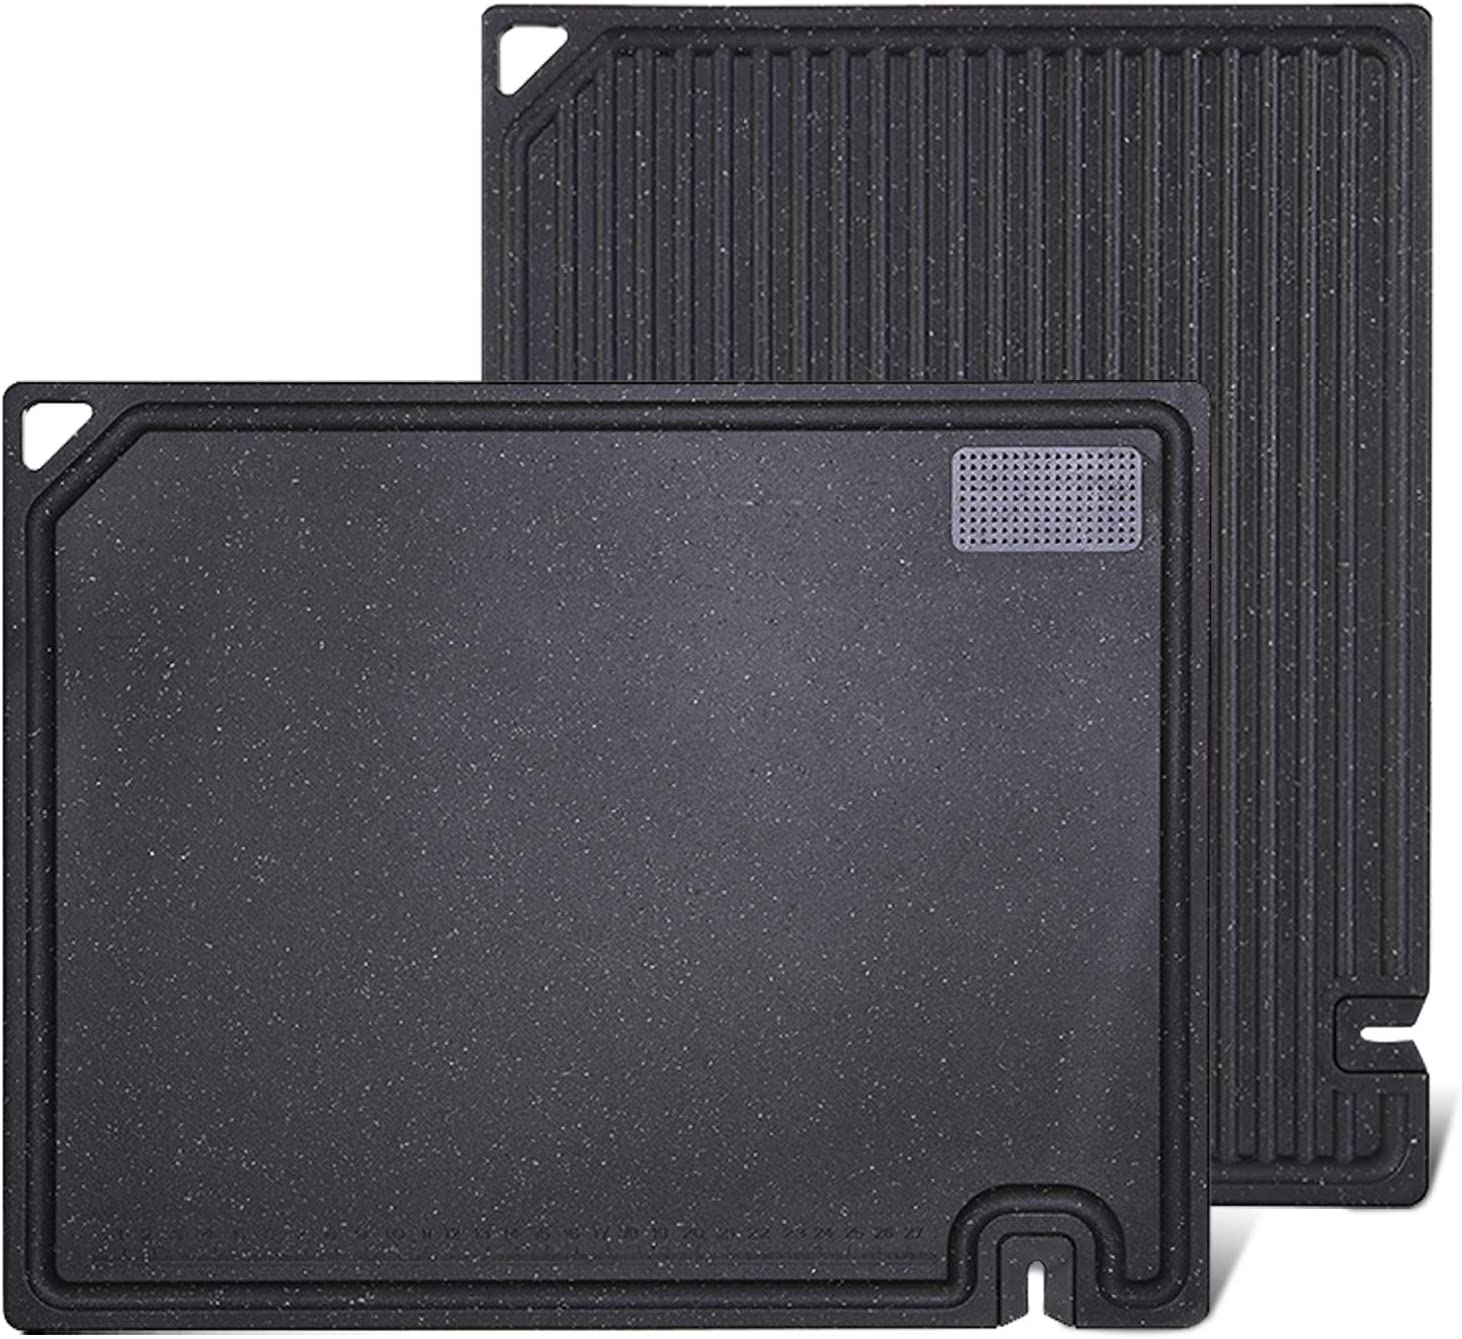 Large Black Cutting Board with Food Grinder and Knife Sharpener, Dishwasher Safe, Food Safe Plastic Material, 16 X 13 Inch, BPA-Free, Juice Groove